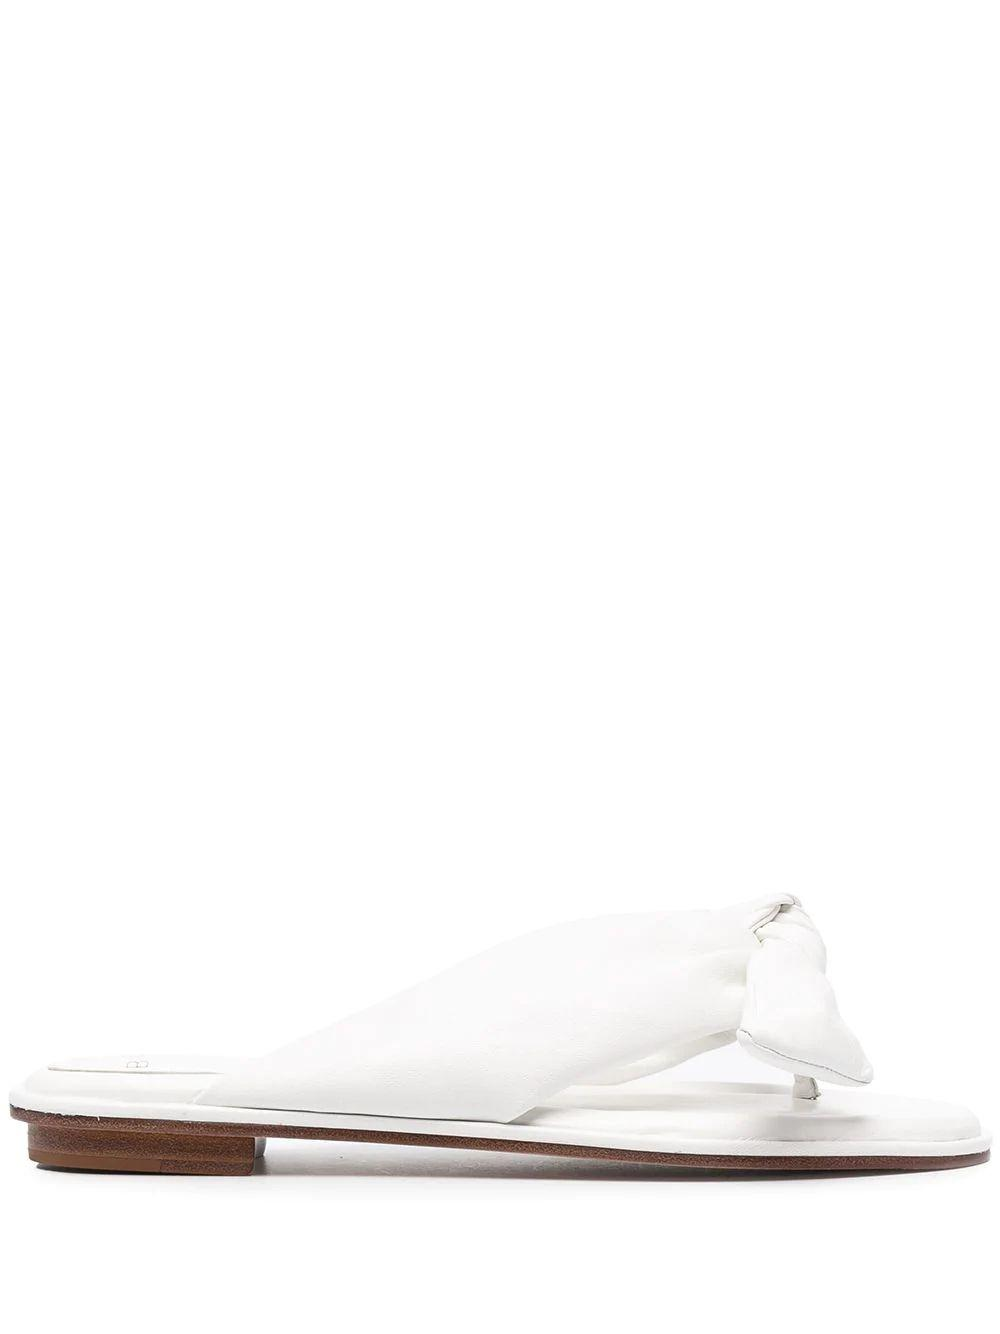 Soft Clarita Flat Sandal Item # B3541800010005